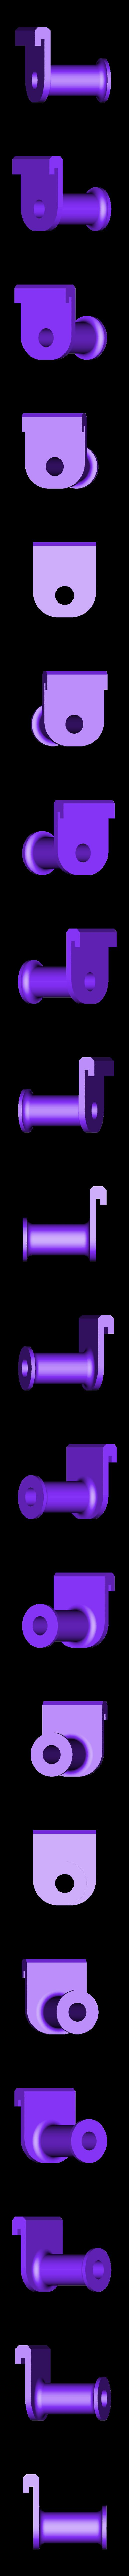 fabrikator_filament_holder_v2.stl Télécharger fichier GCODE gratuit Fabrikator Mini Filament Spool • Objet à imprimer en 3D, philbarrenger